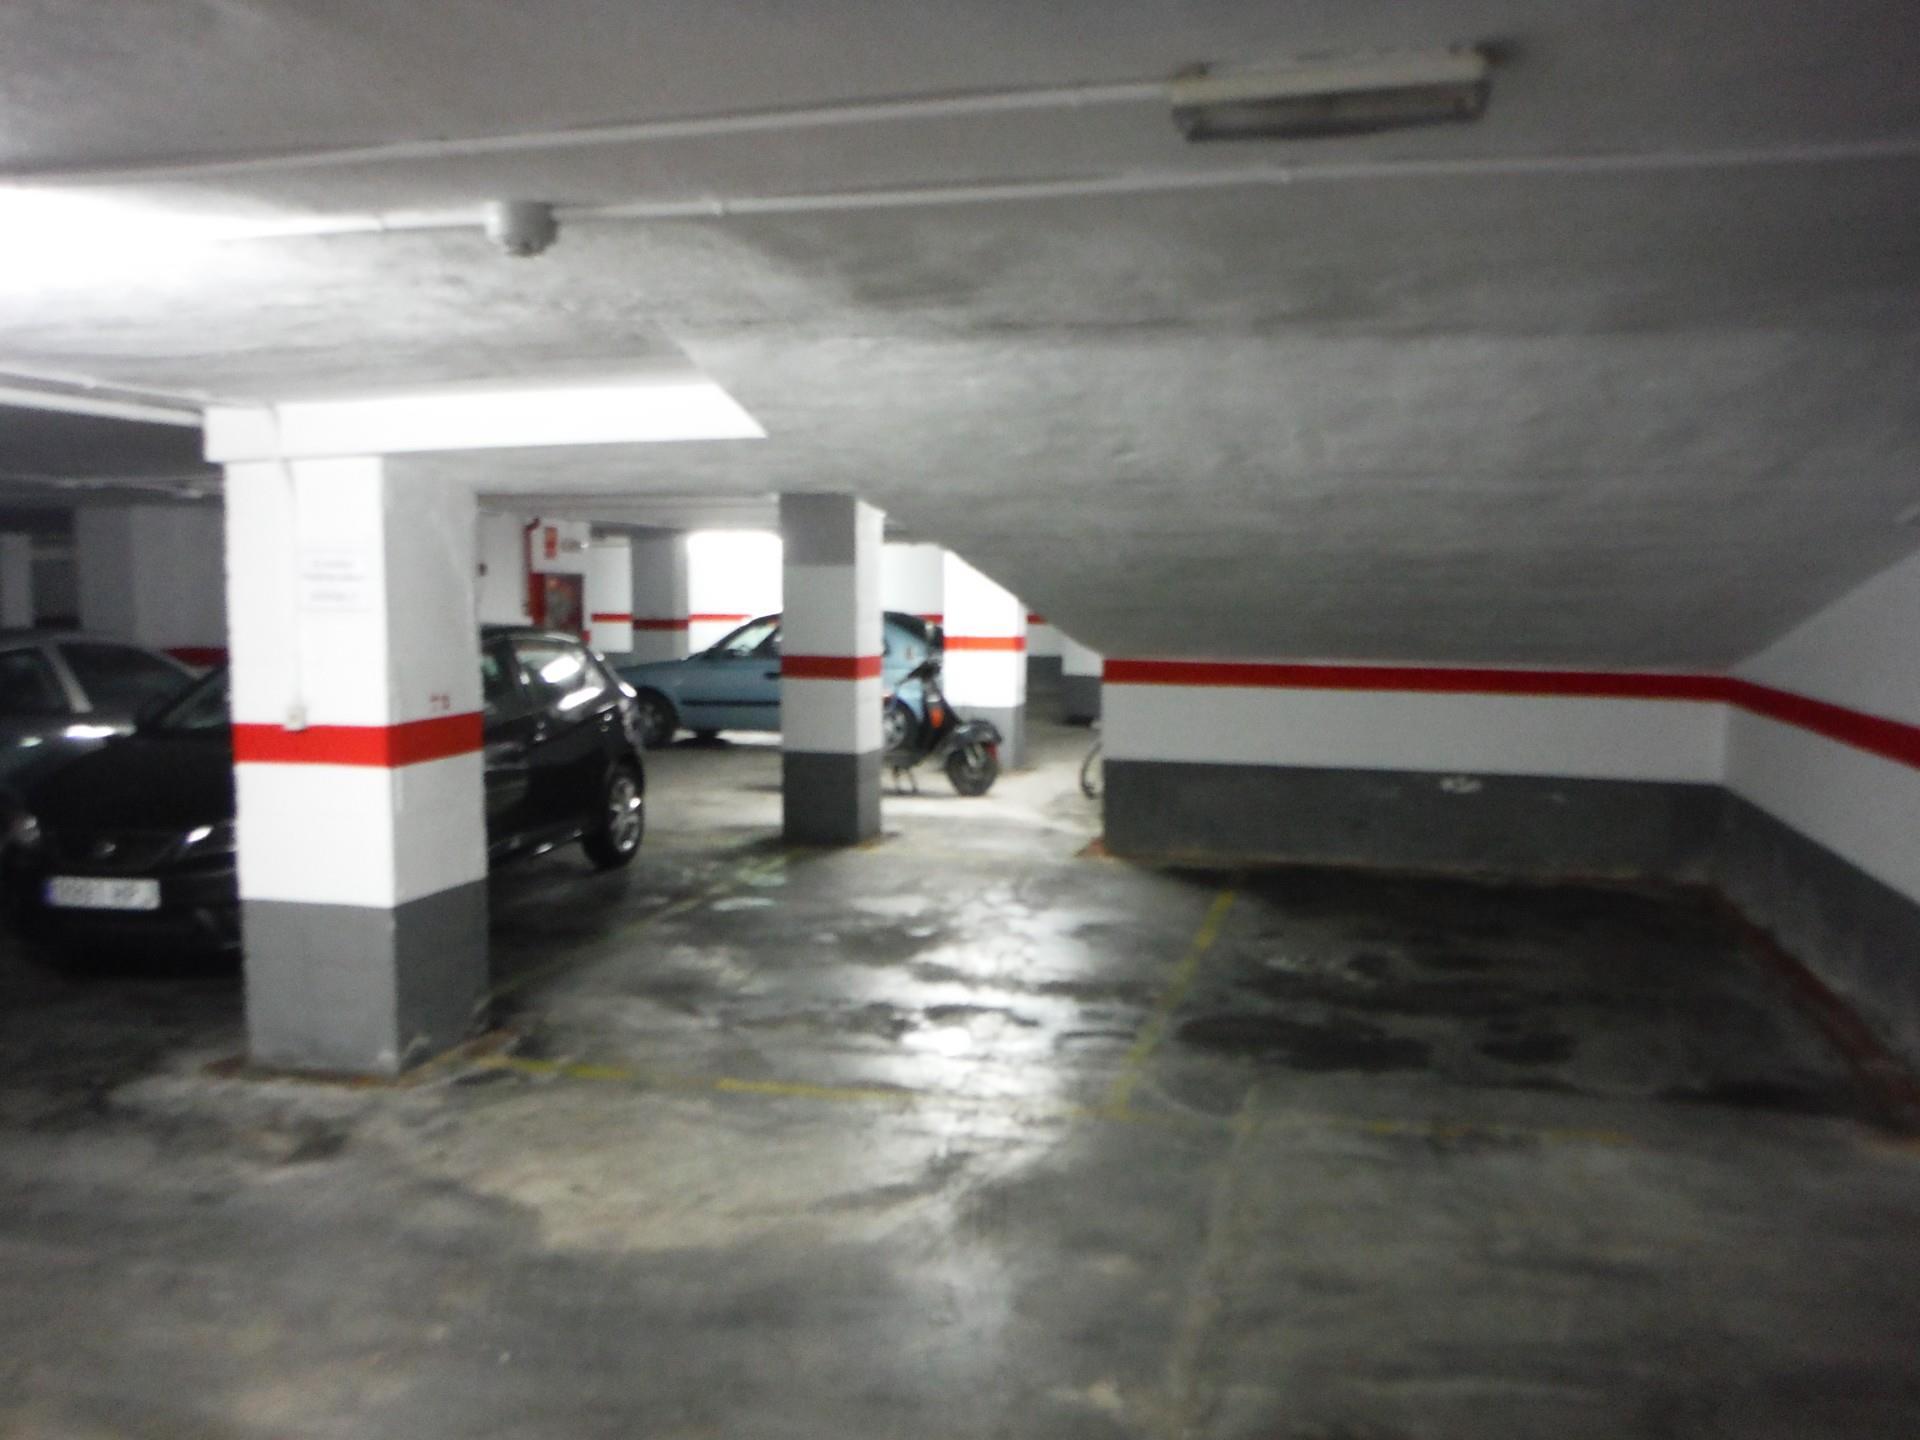 Lloguer Aparcament cotxe  Plaza poeta vicente gaos. La bega baixa - plaza xúquer / plaza poeta vicente